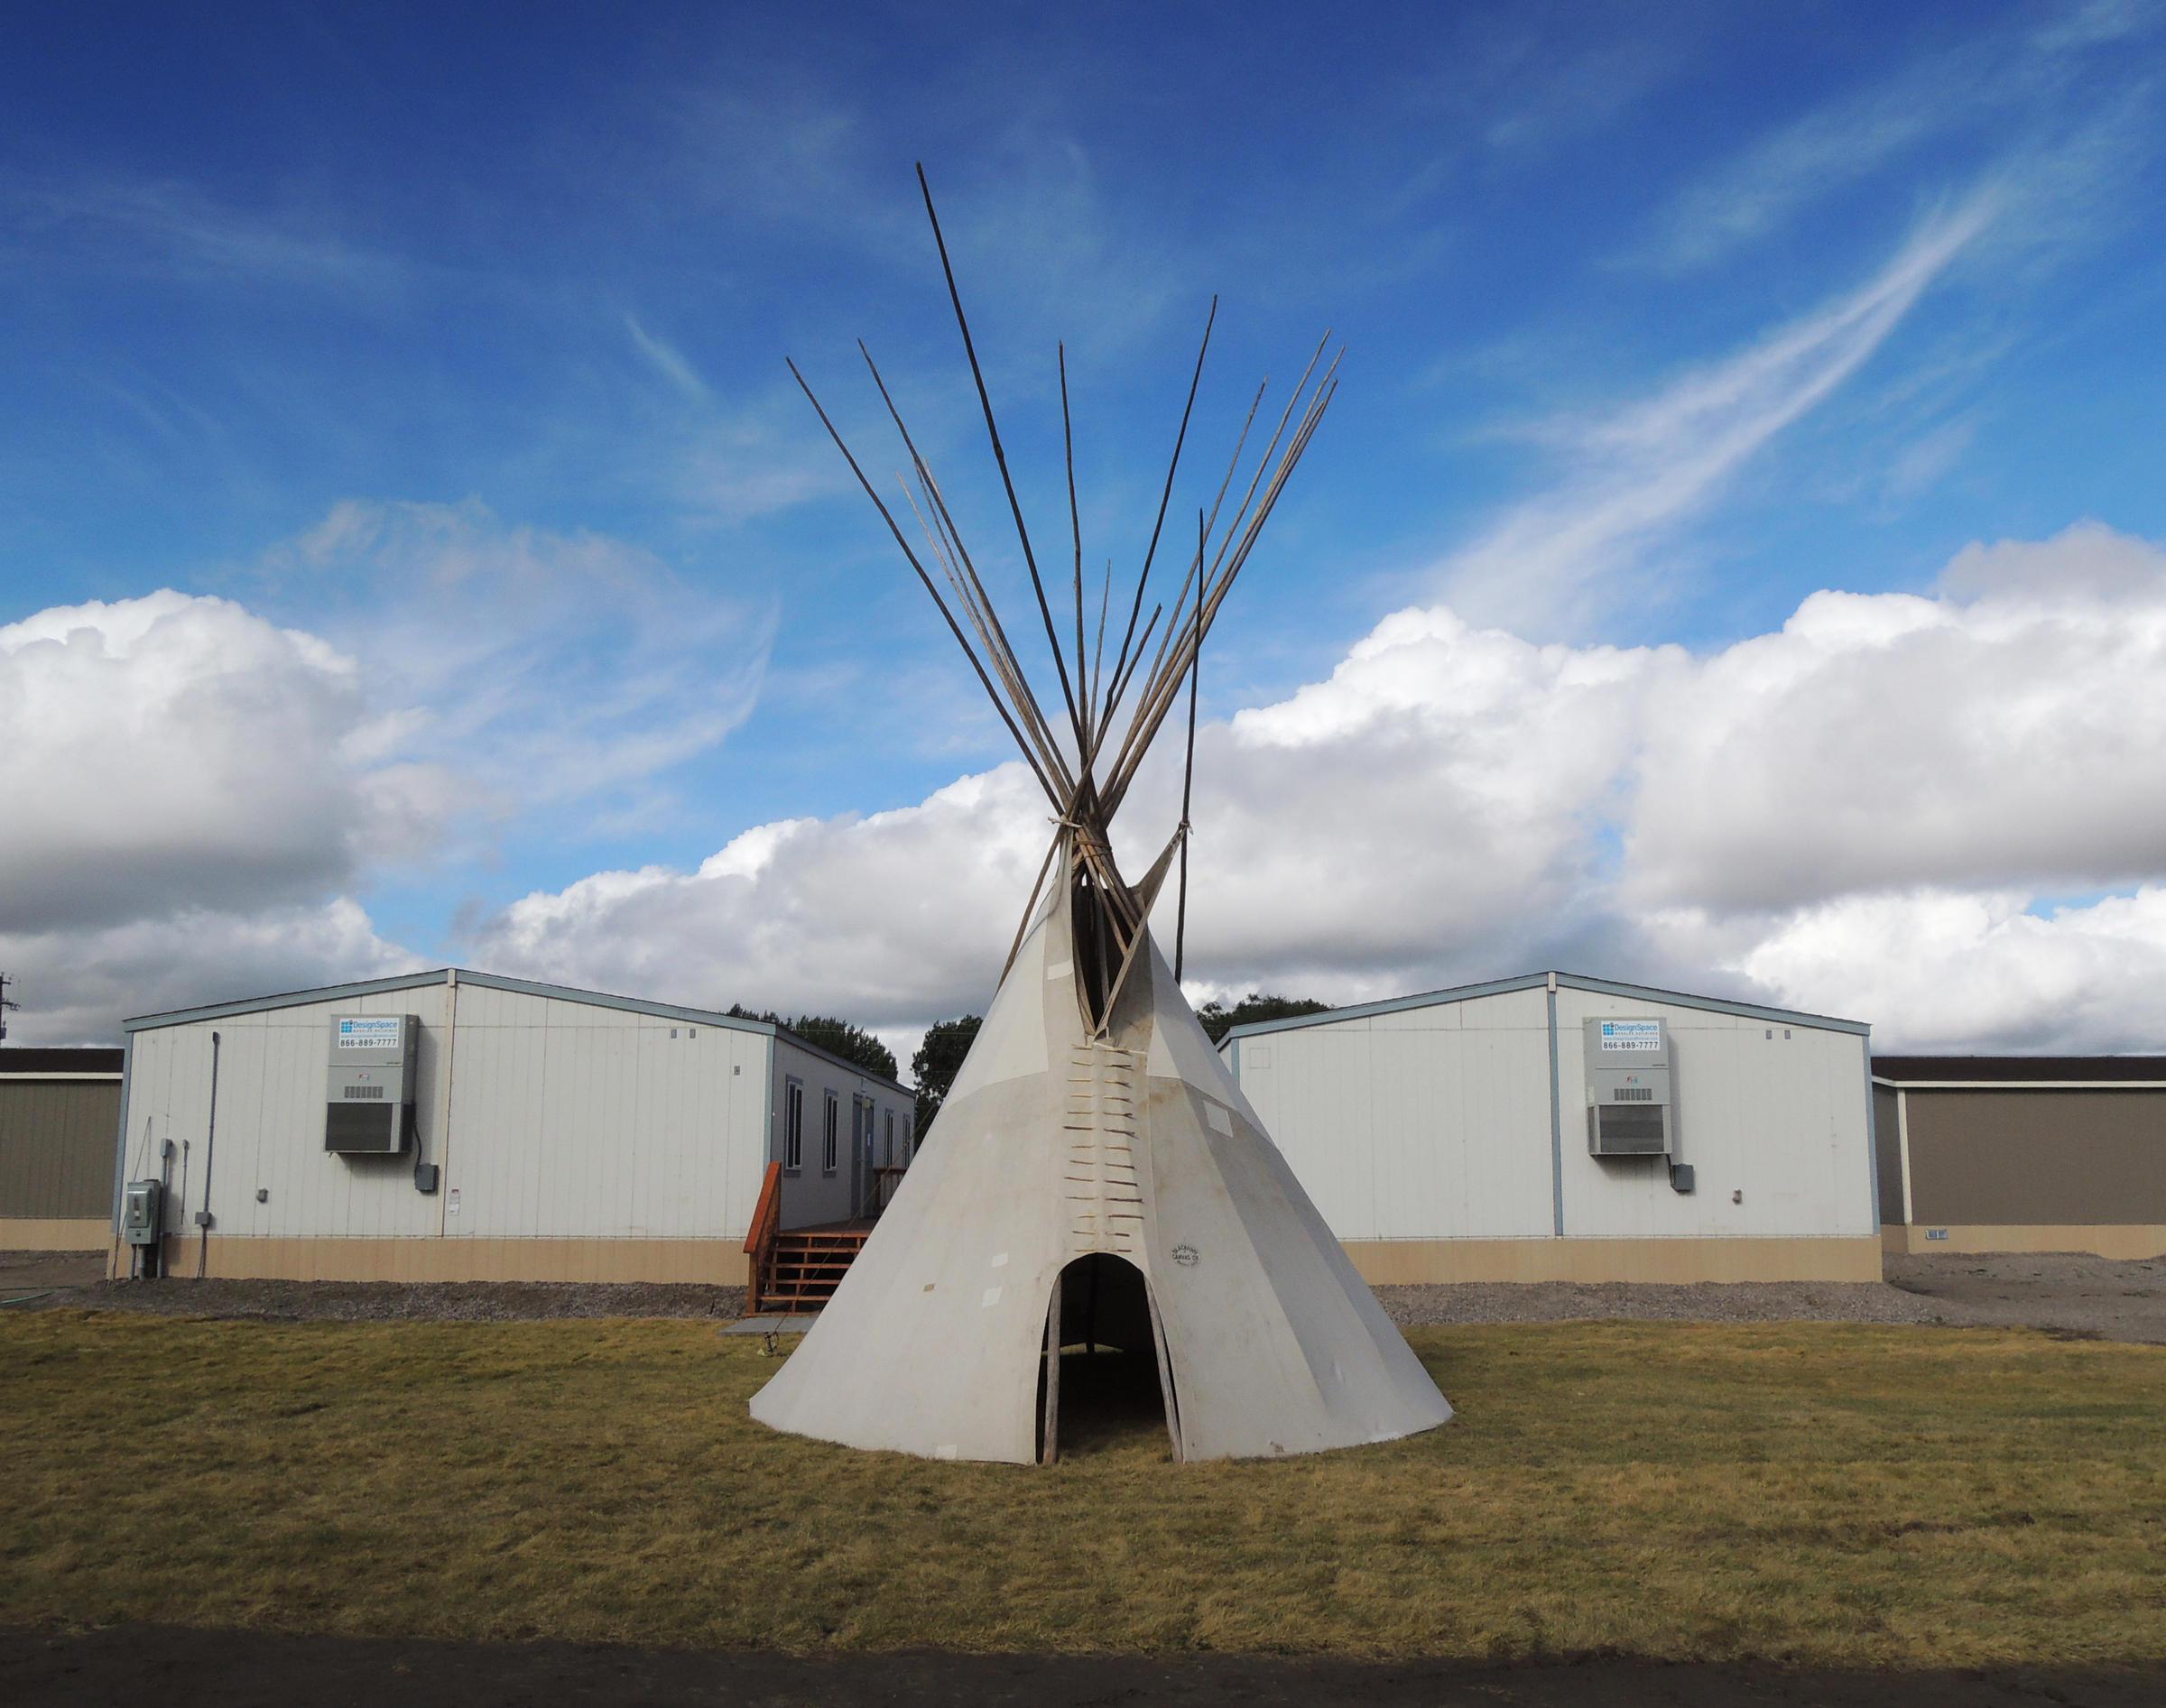 Idaho S First Public Native American Language School Works